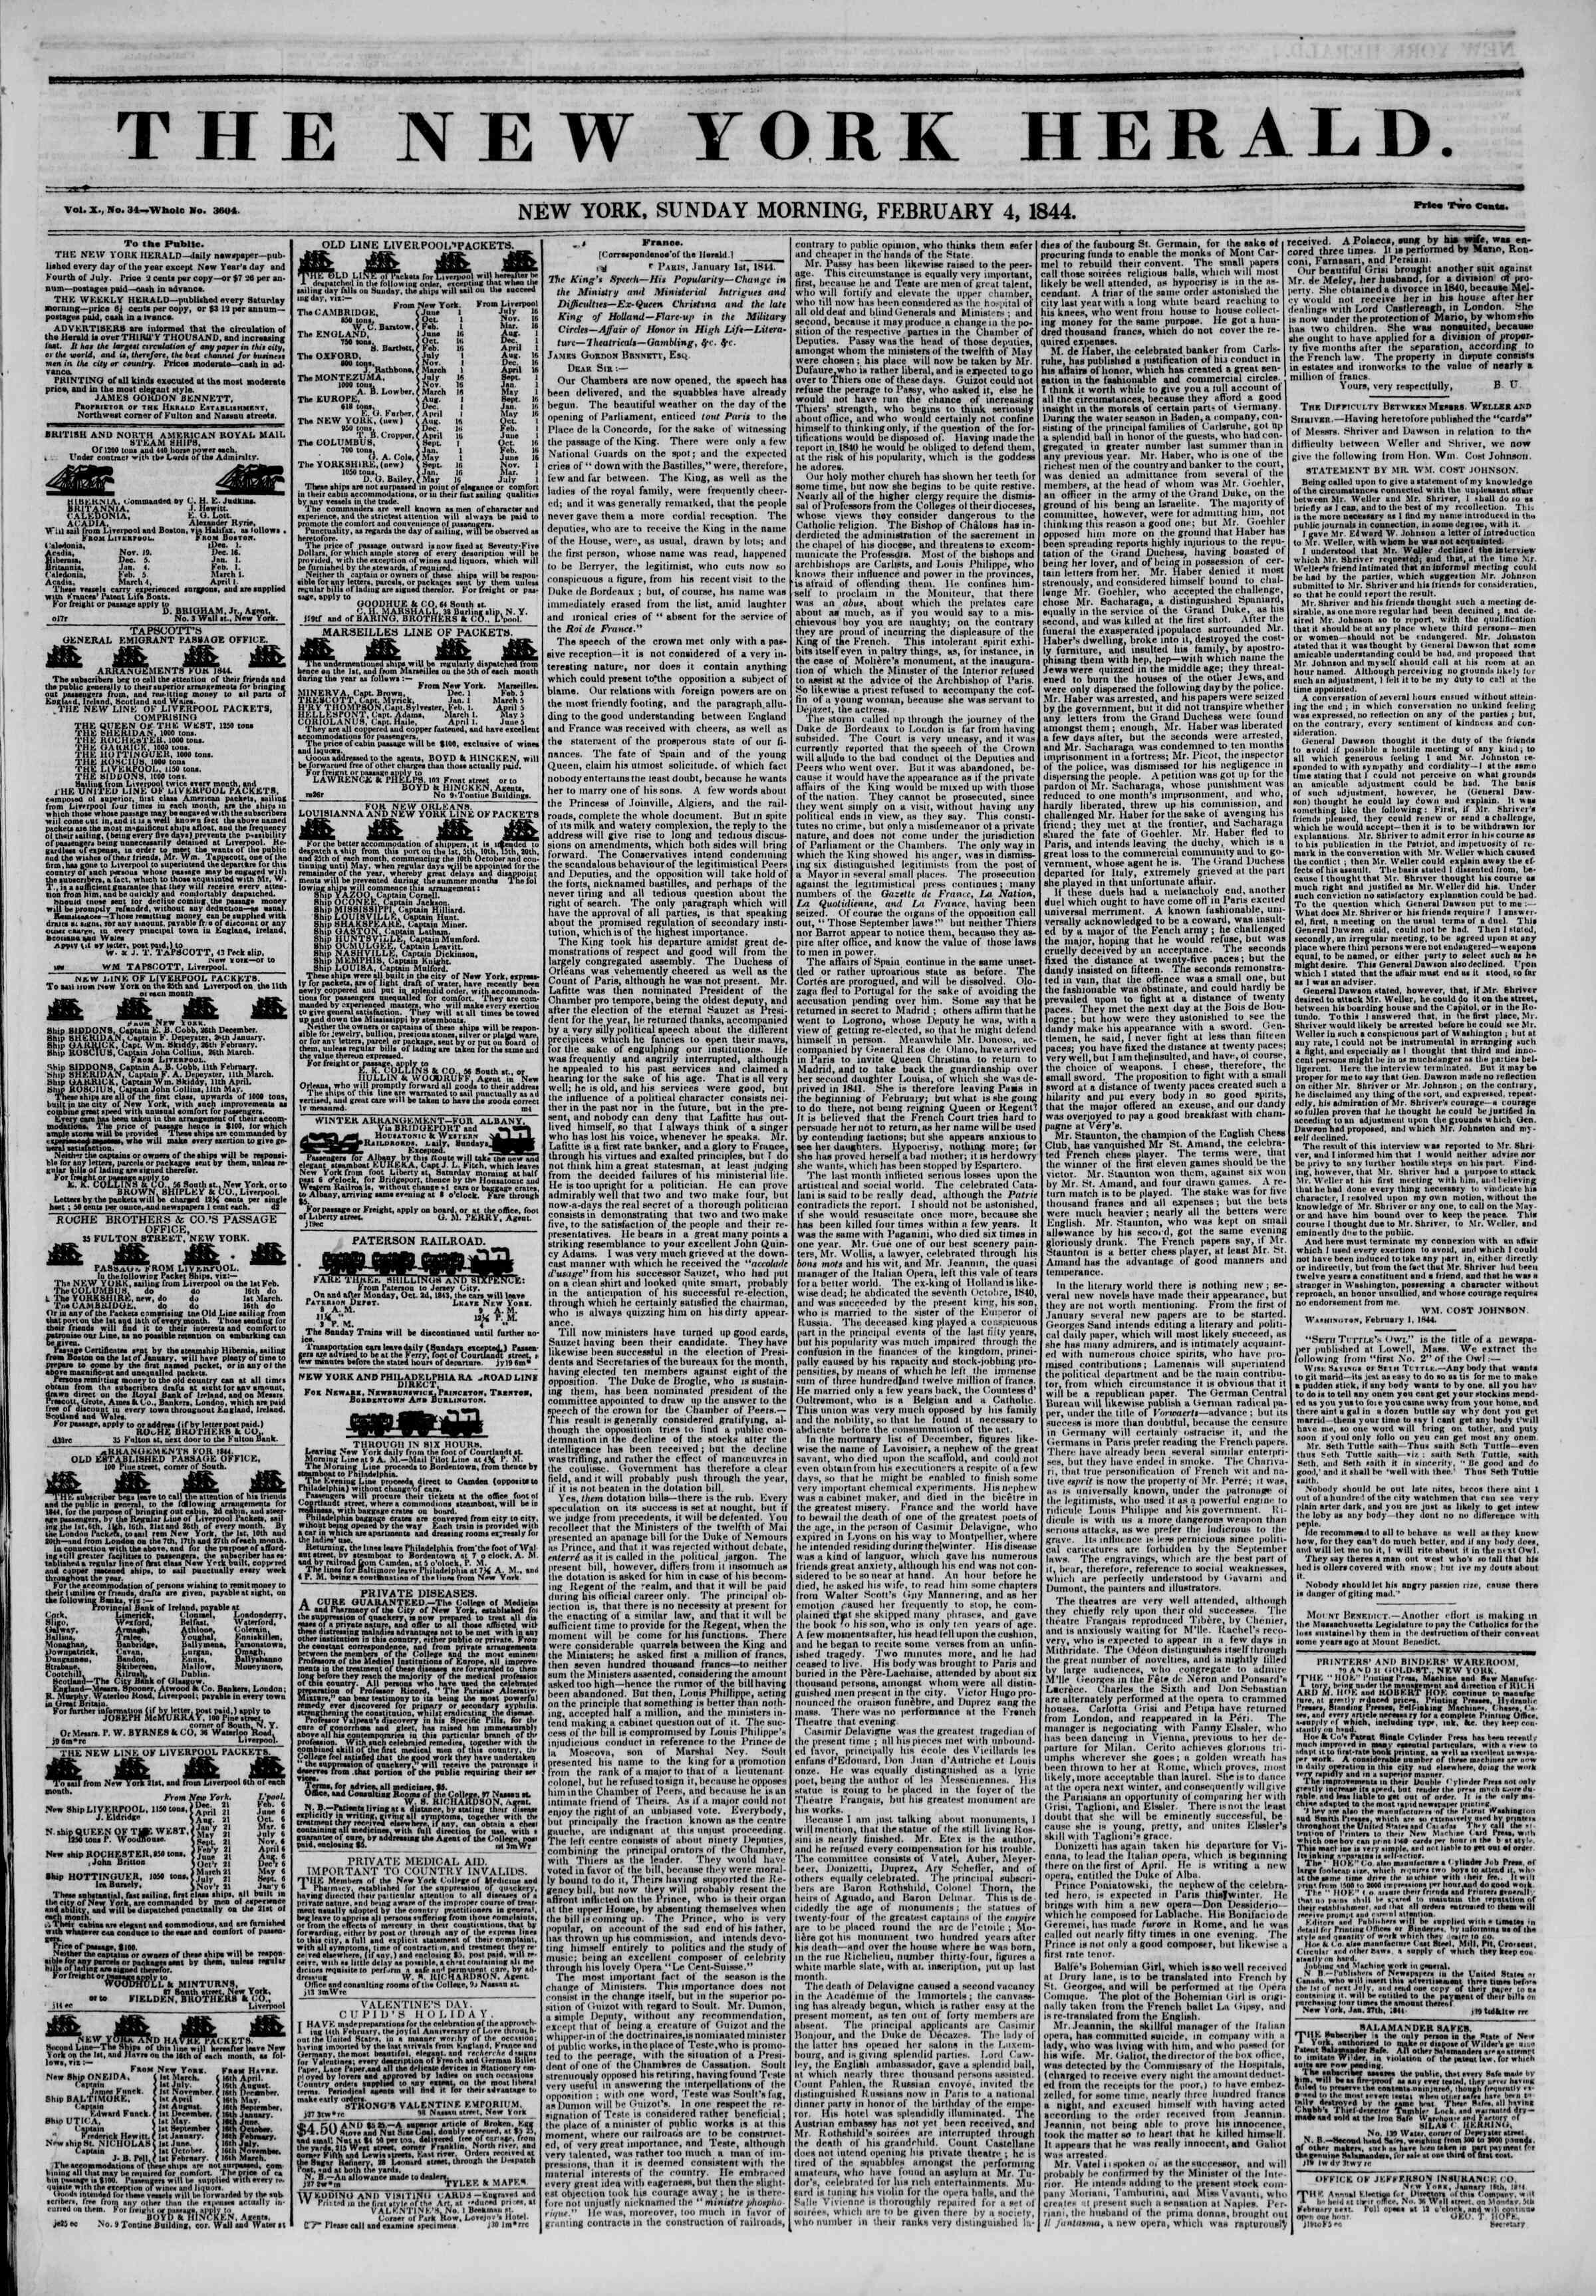 February 4, 1844 Tarihli The New York Herald Gazetesi Sayfa 1